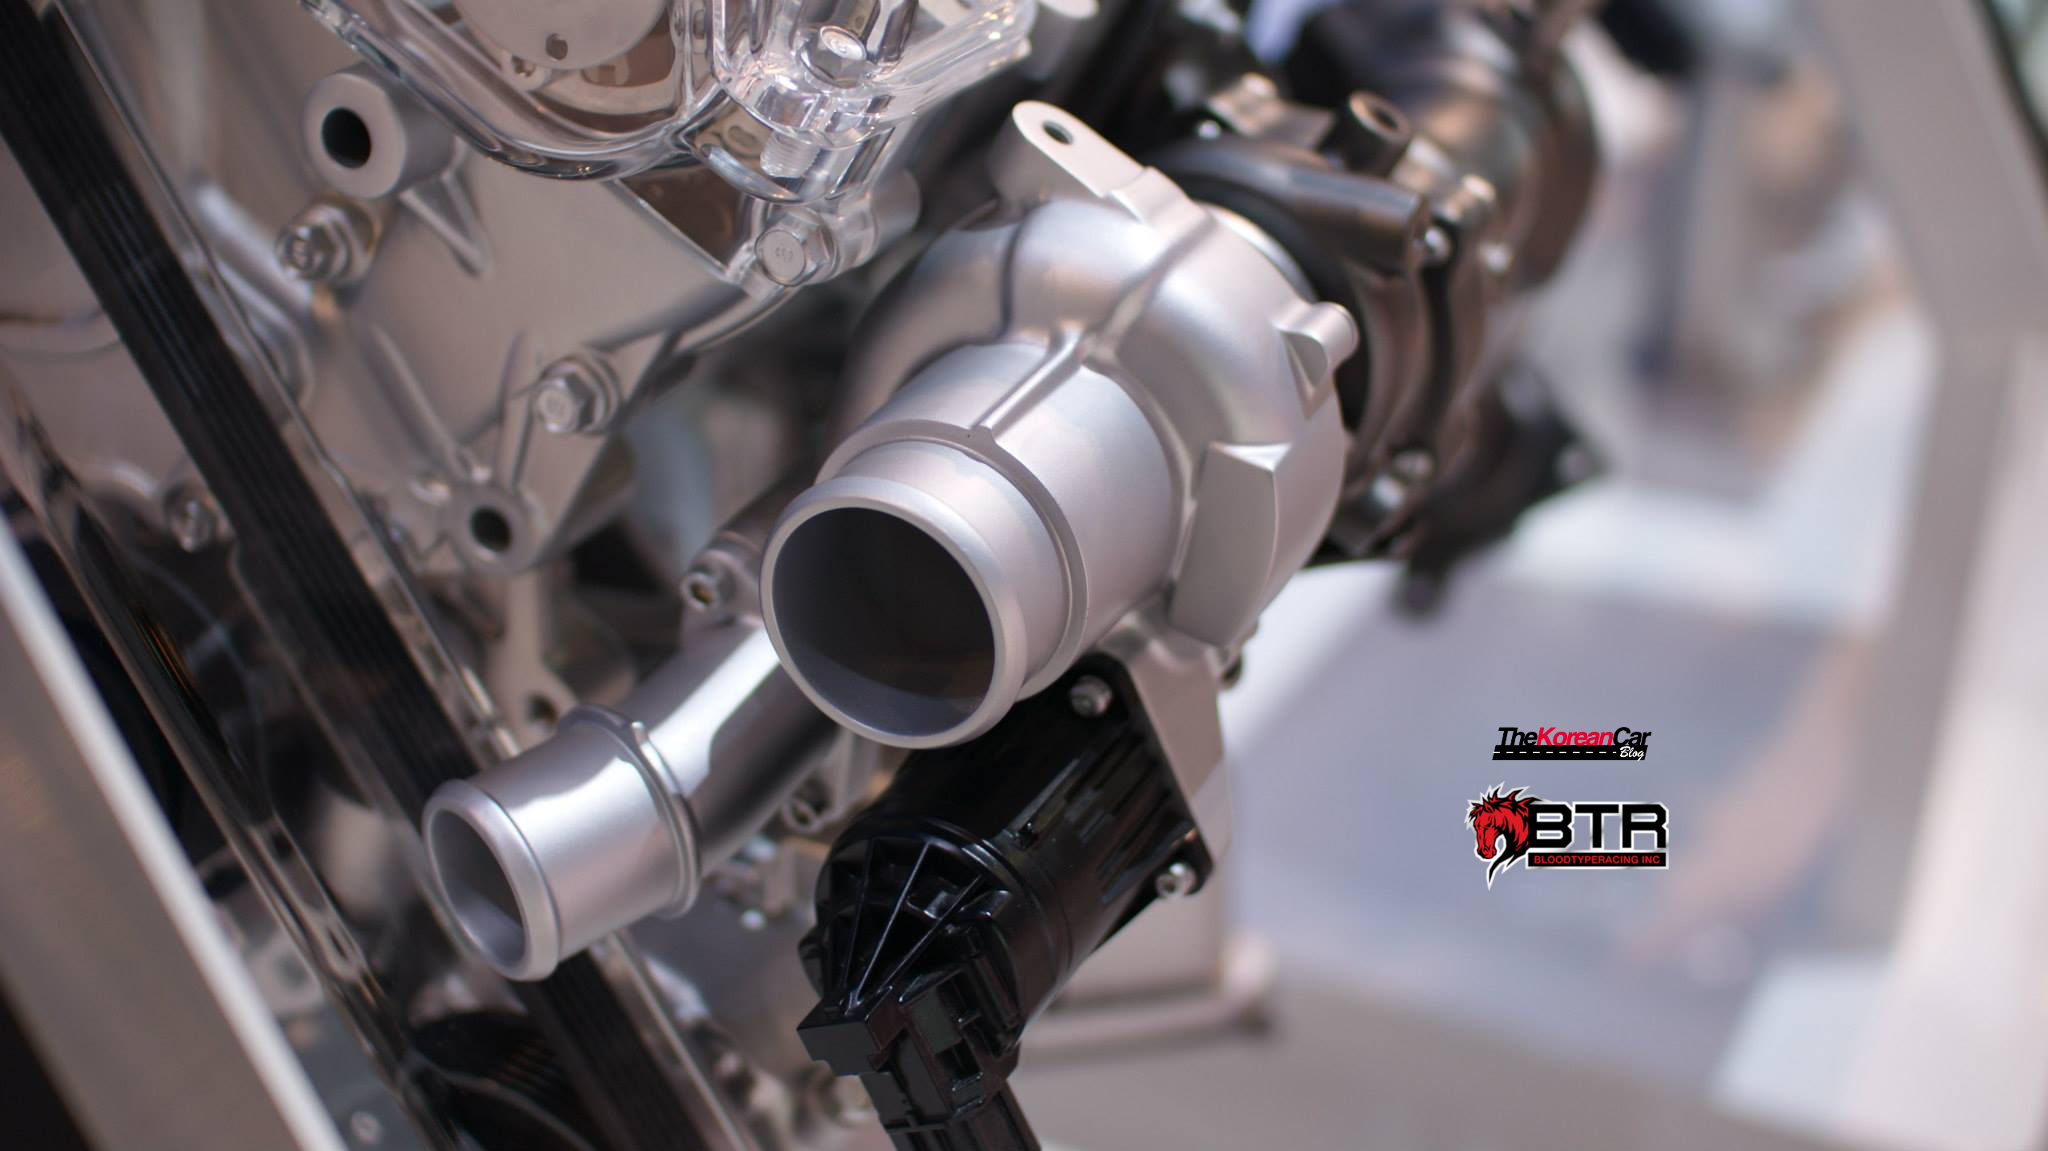 Exclusive: Hyundai 3 3 Turbo GDi V6 Engine - Korean Car Blog